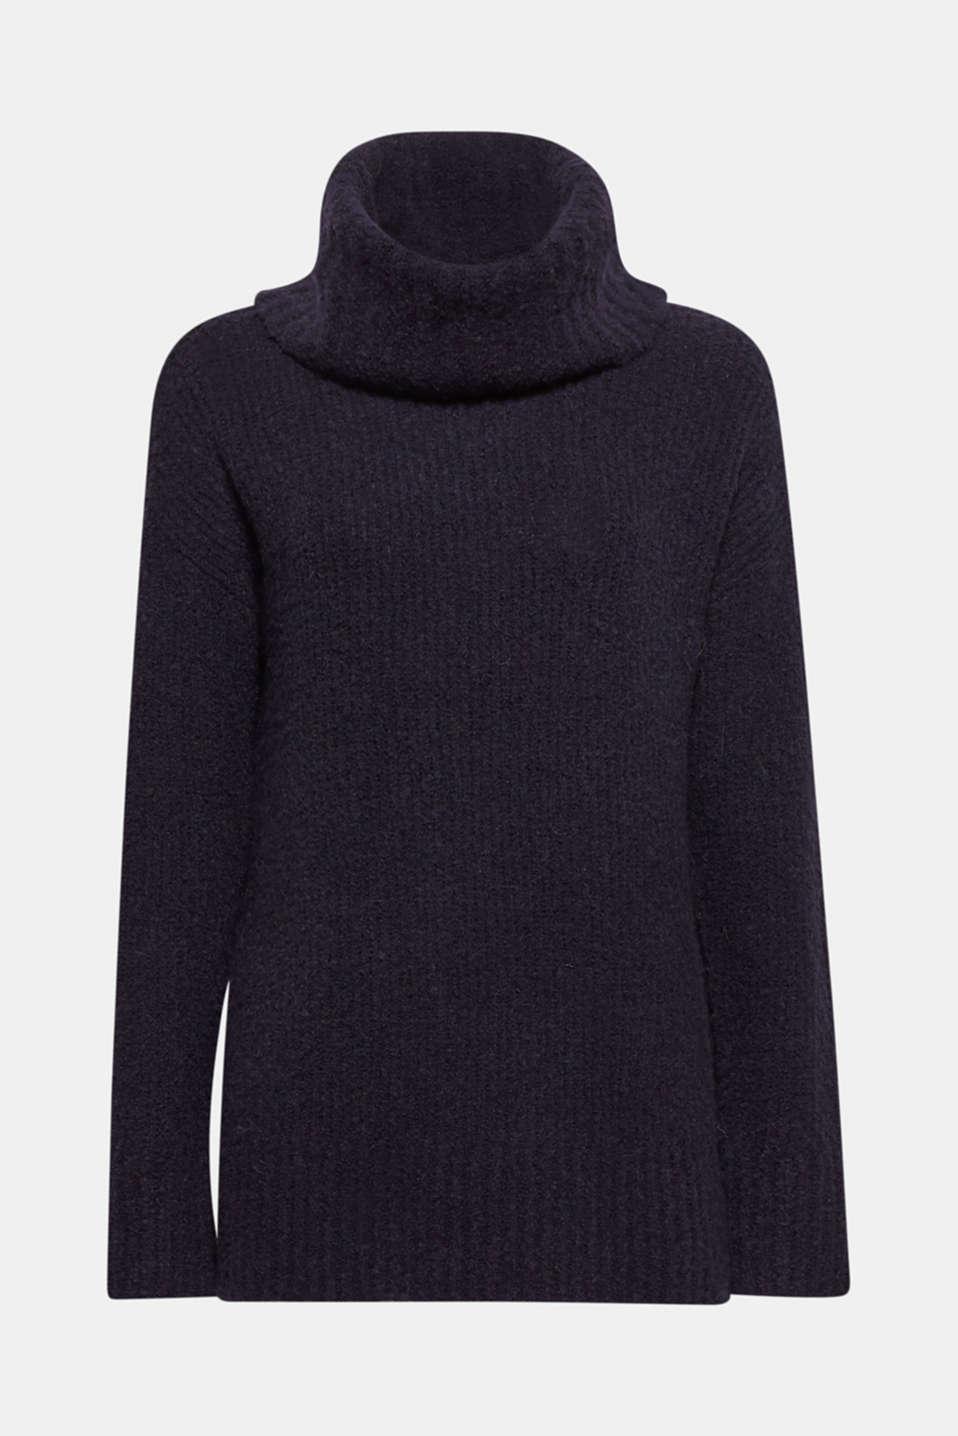 Wool/alpaca blend: polo neck jumper, NAVY, detail image number 8